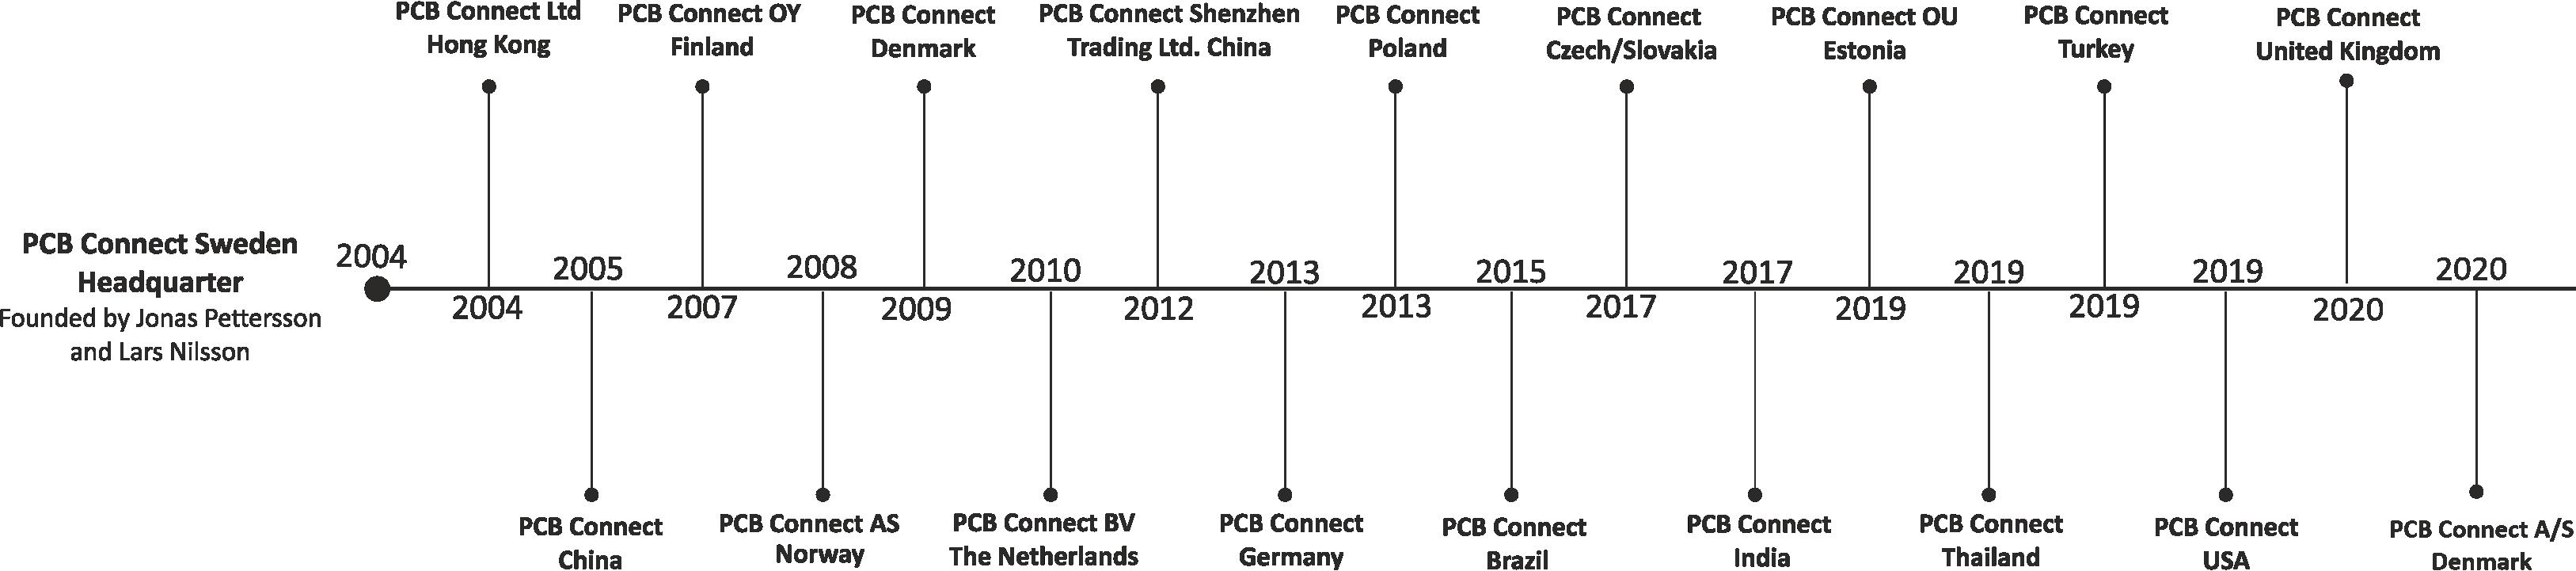 PCB Connect Timeline - Website